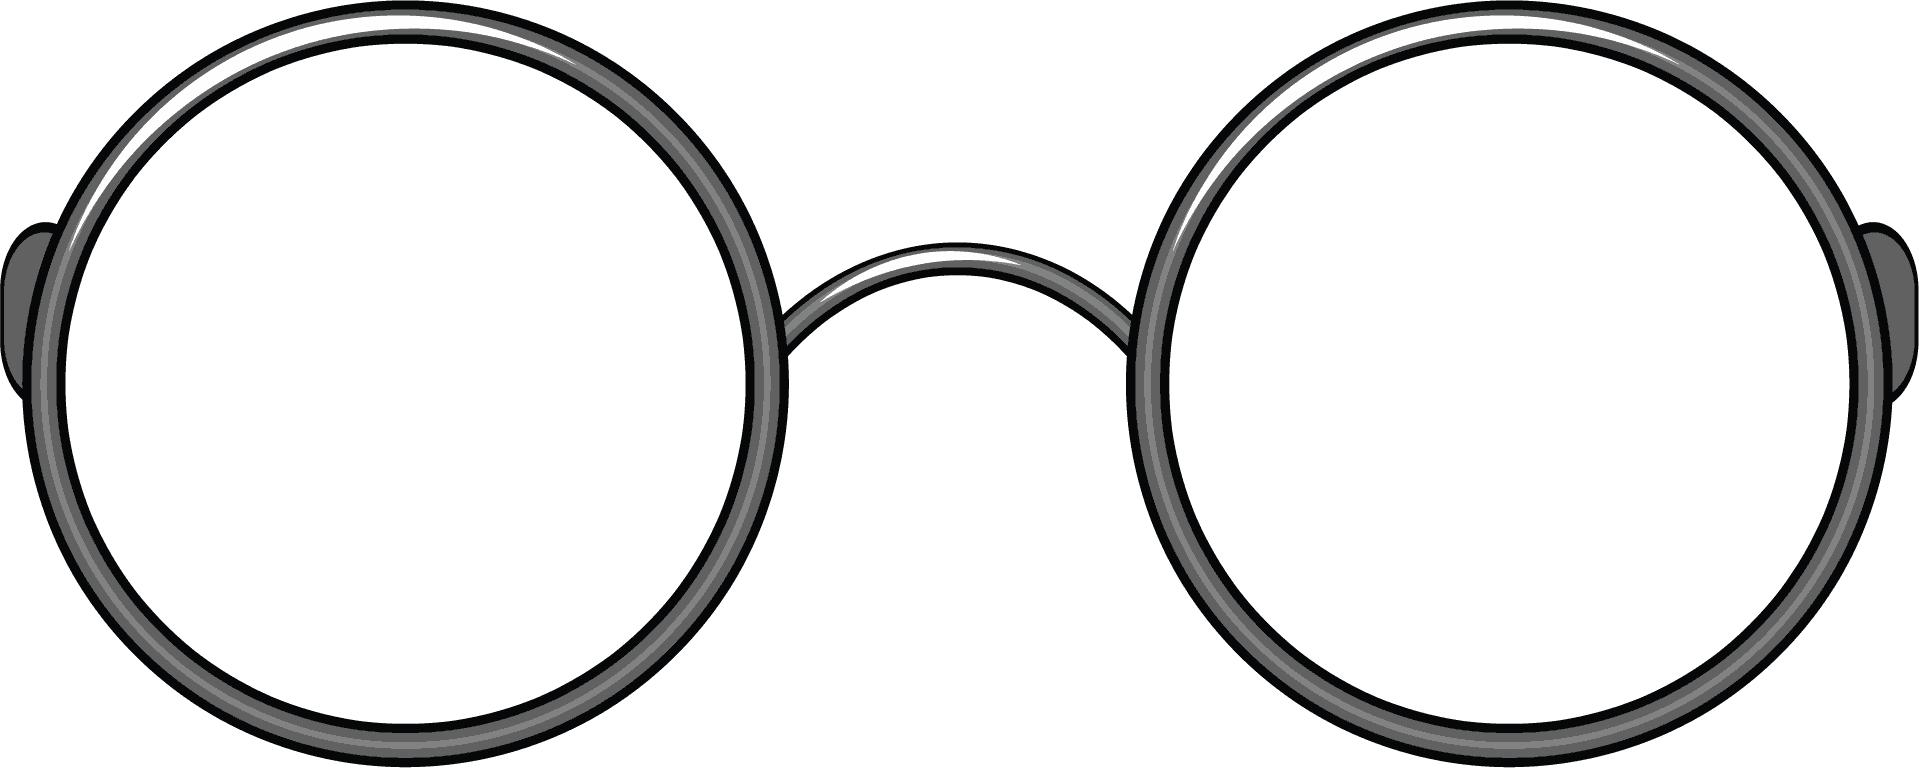 Glasses Clip Art Images Free .-Glasses Clip Art Images Free .-5